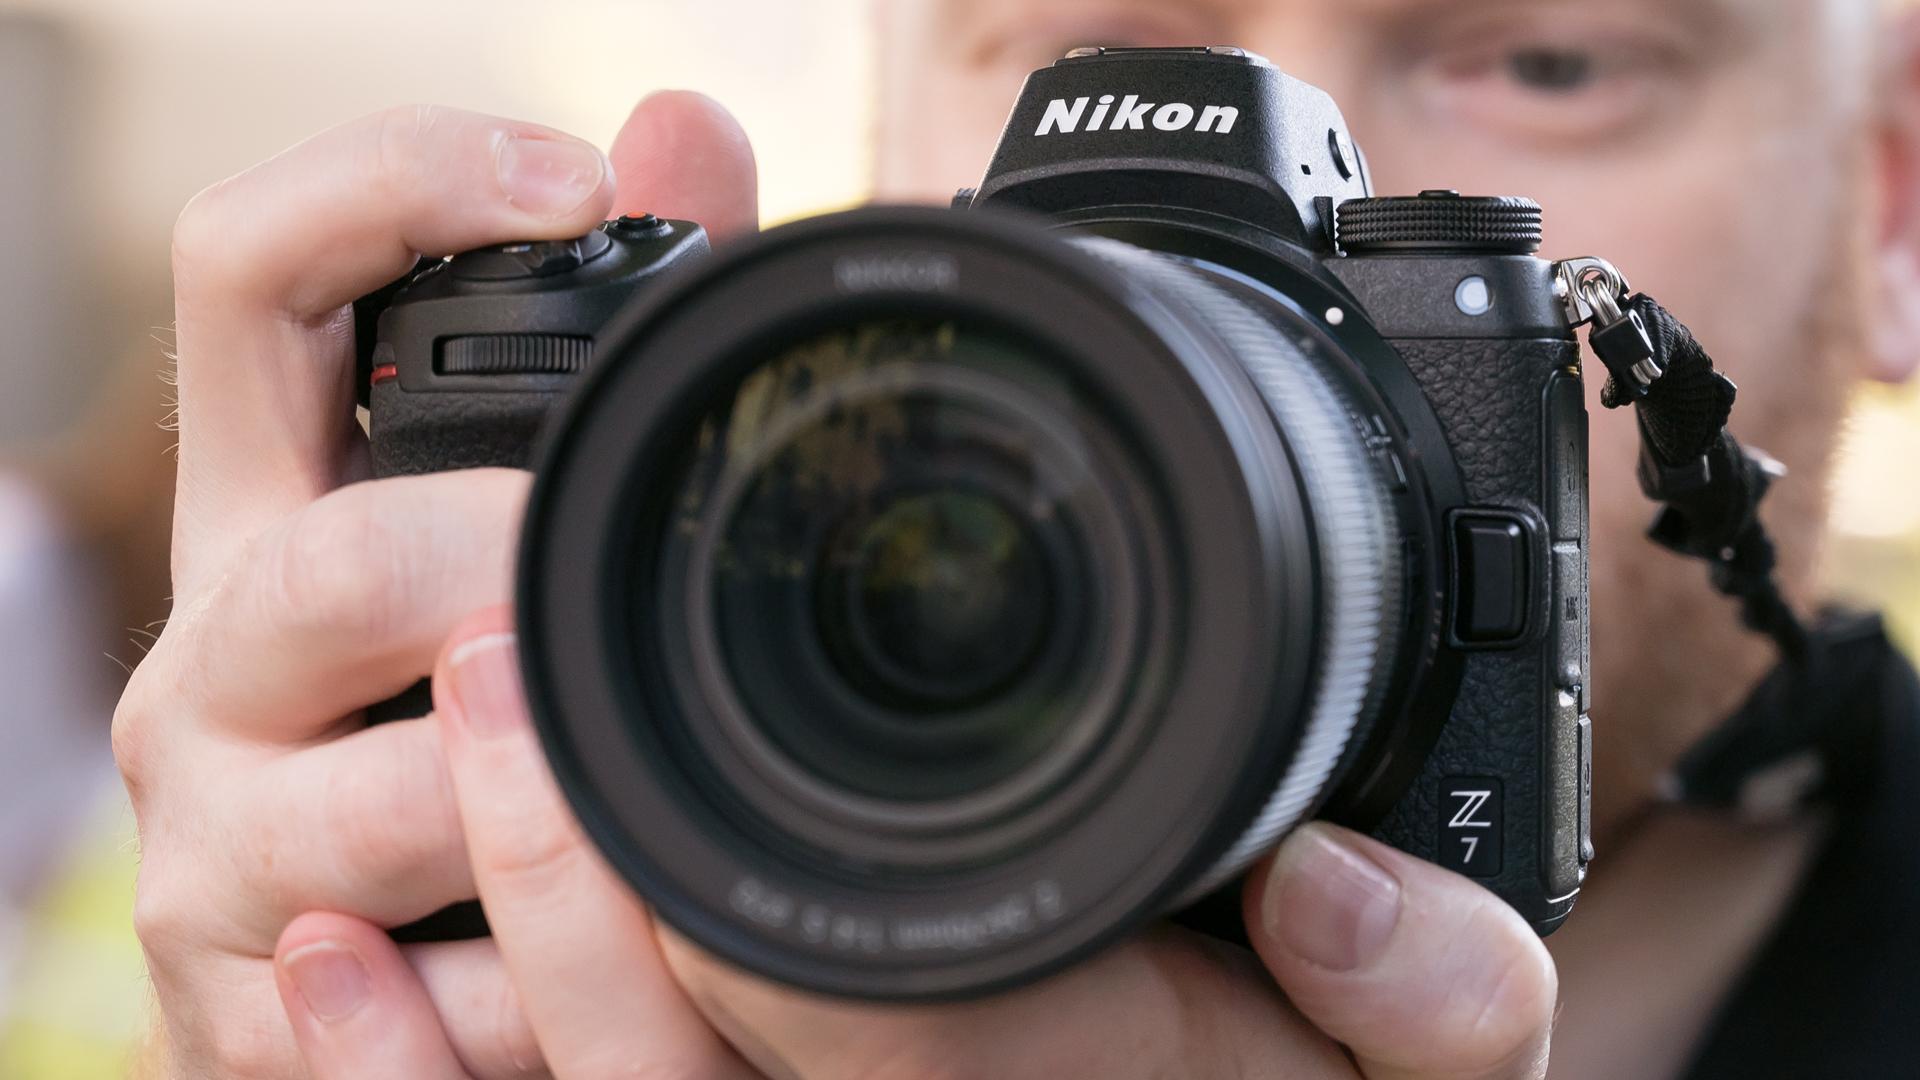 Best mirrorless camera: Nikon Z7